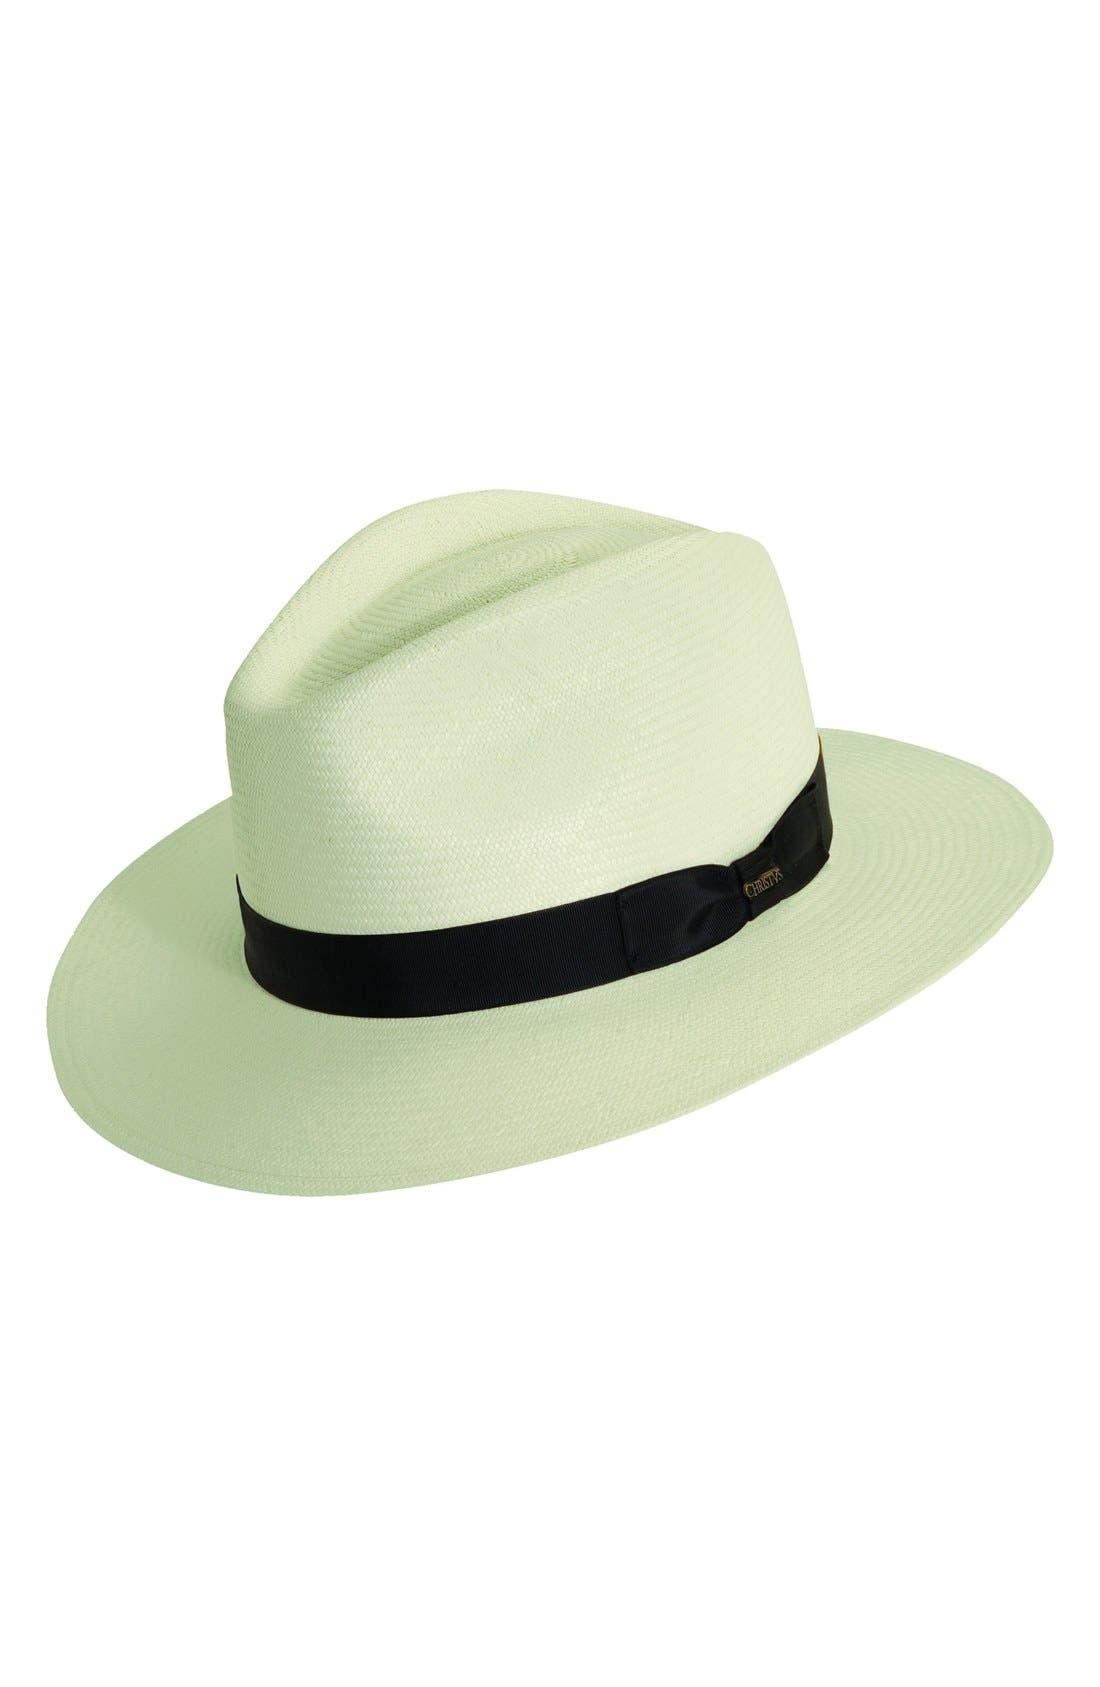 Alternate Image 1 Selected - Christy's London Panama Straw Safari Hat